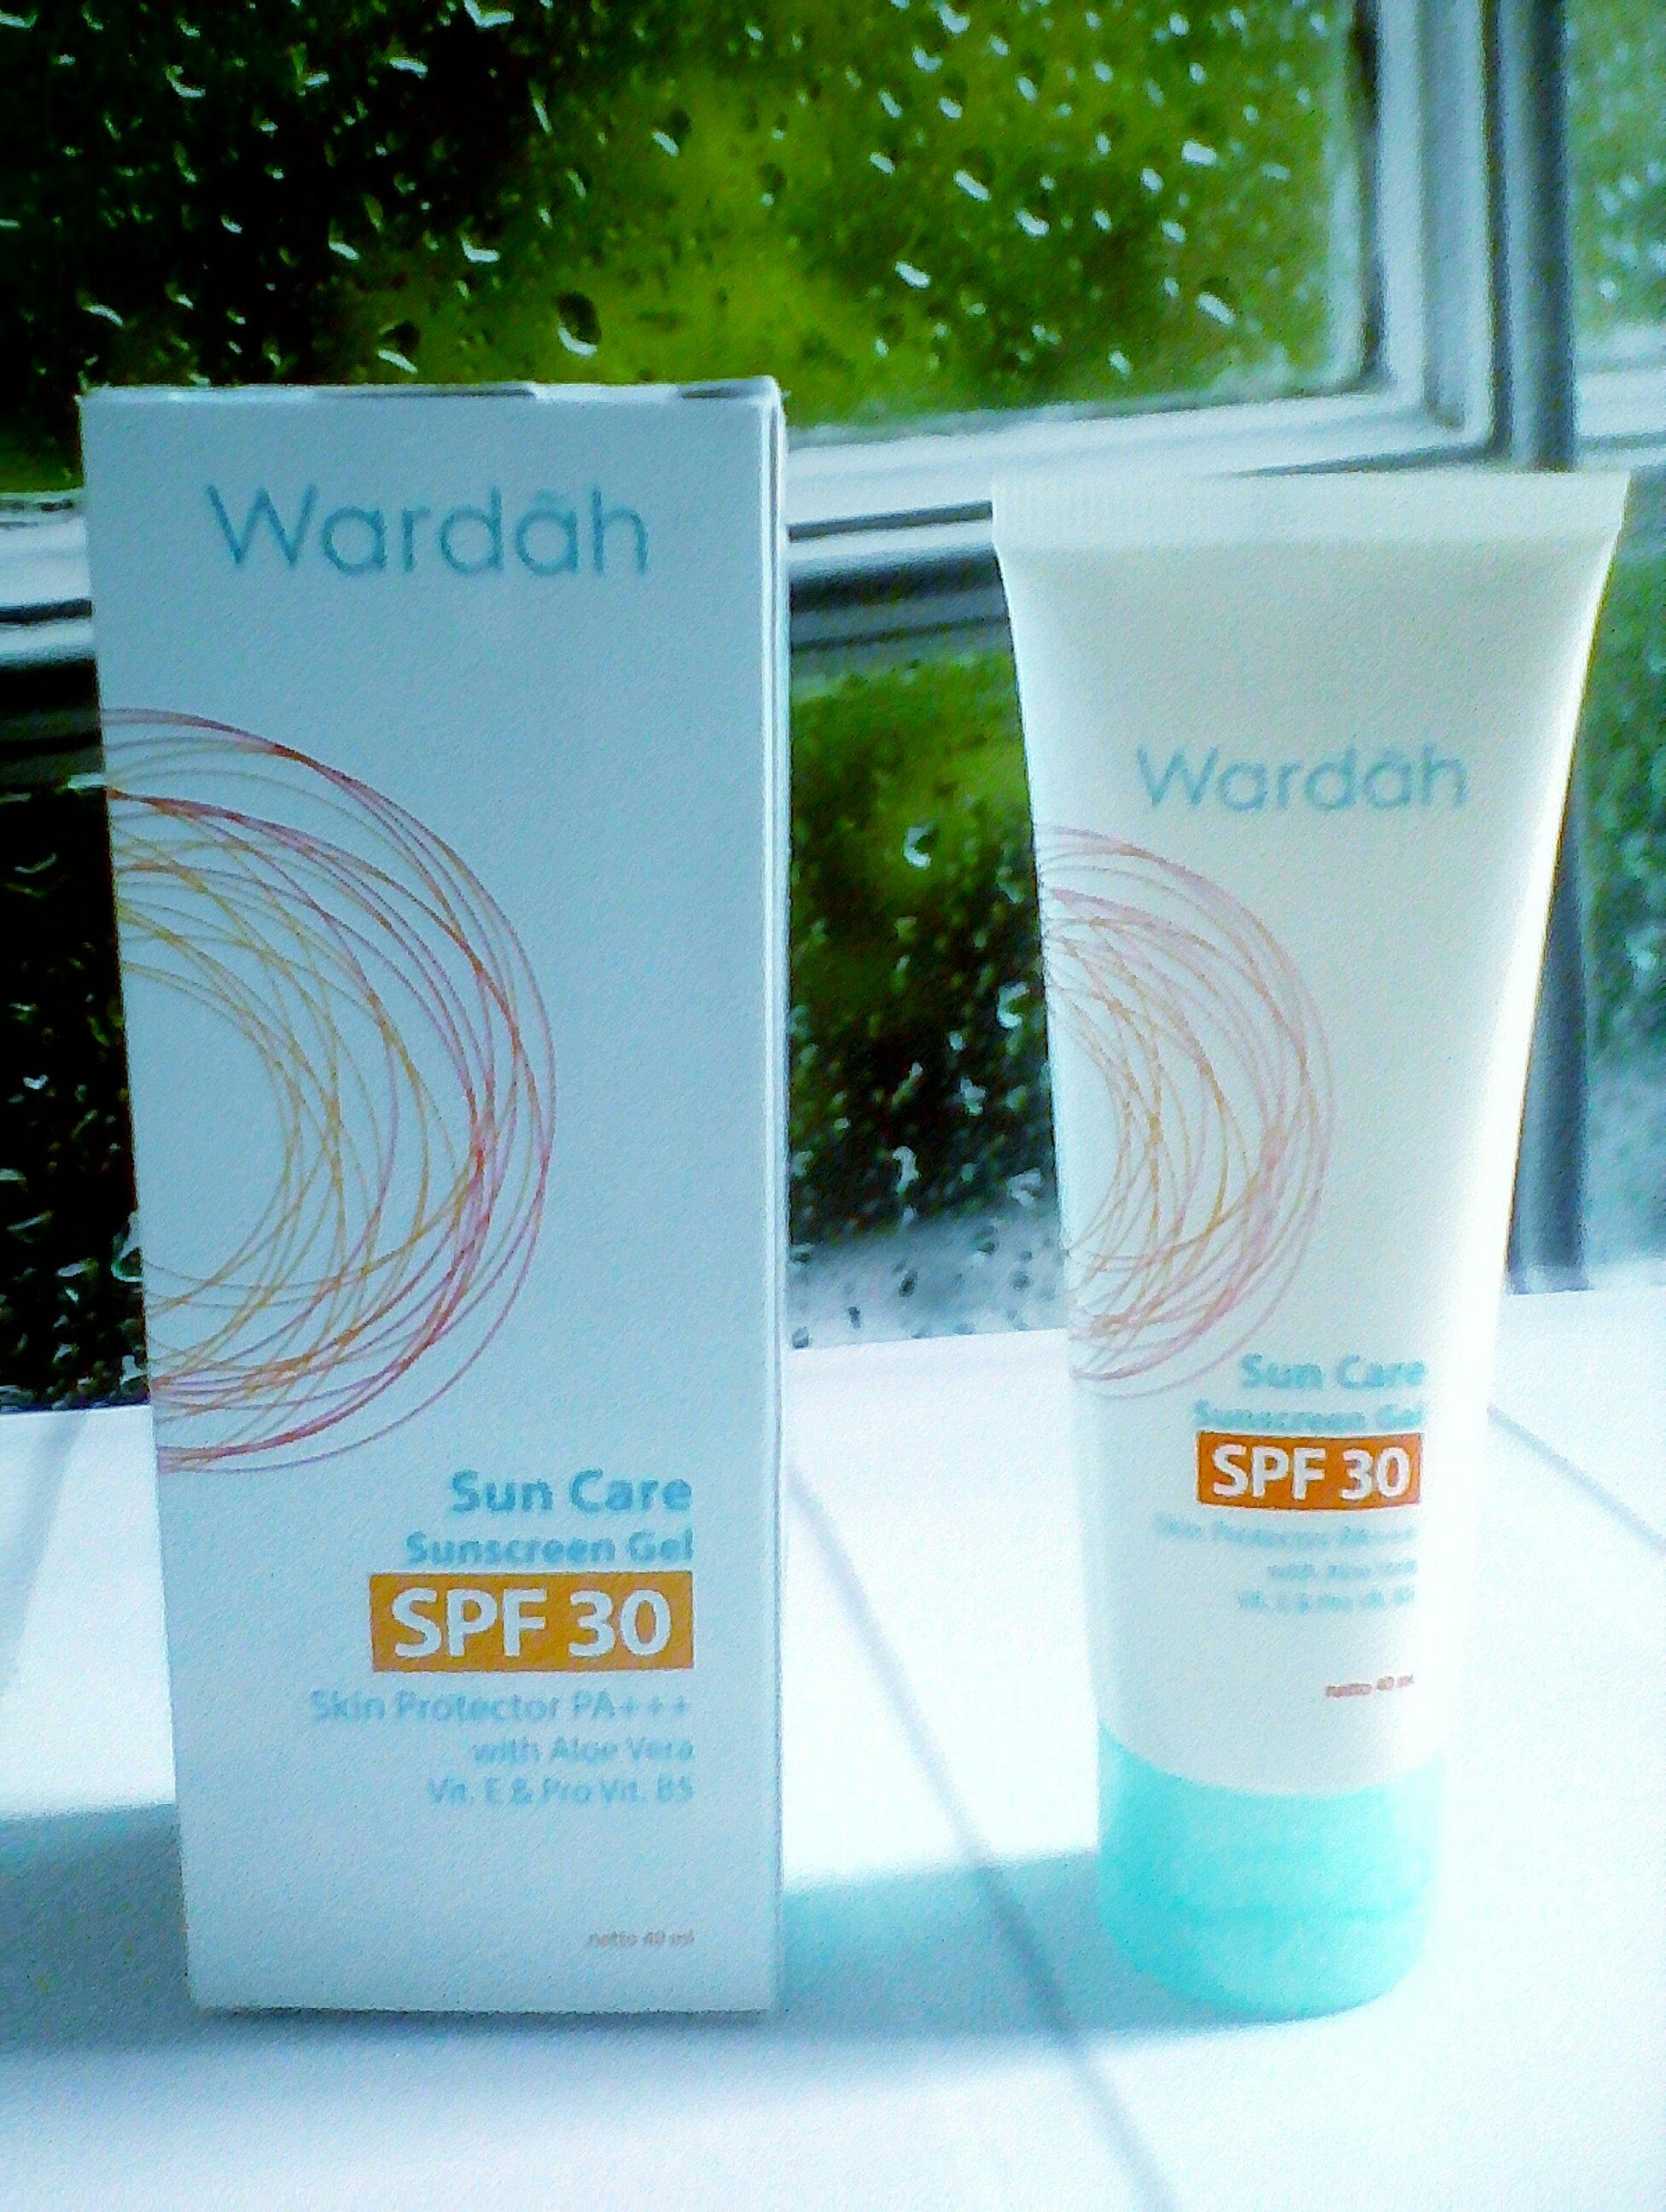 Review Wardah Sunscreen Gel : review, wardah, sunscreen, REVIEW:, Wardah, Sunscreen, PA+++, Brain, Bottle